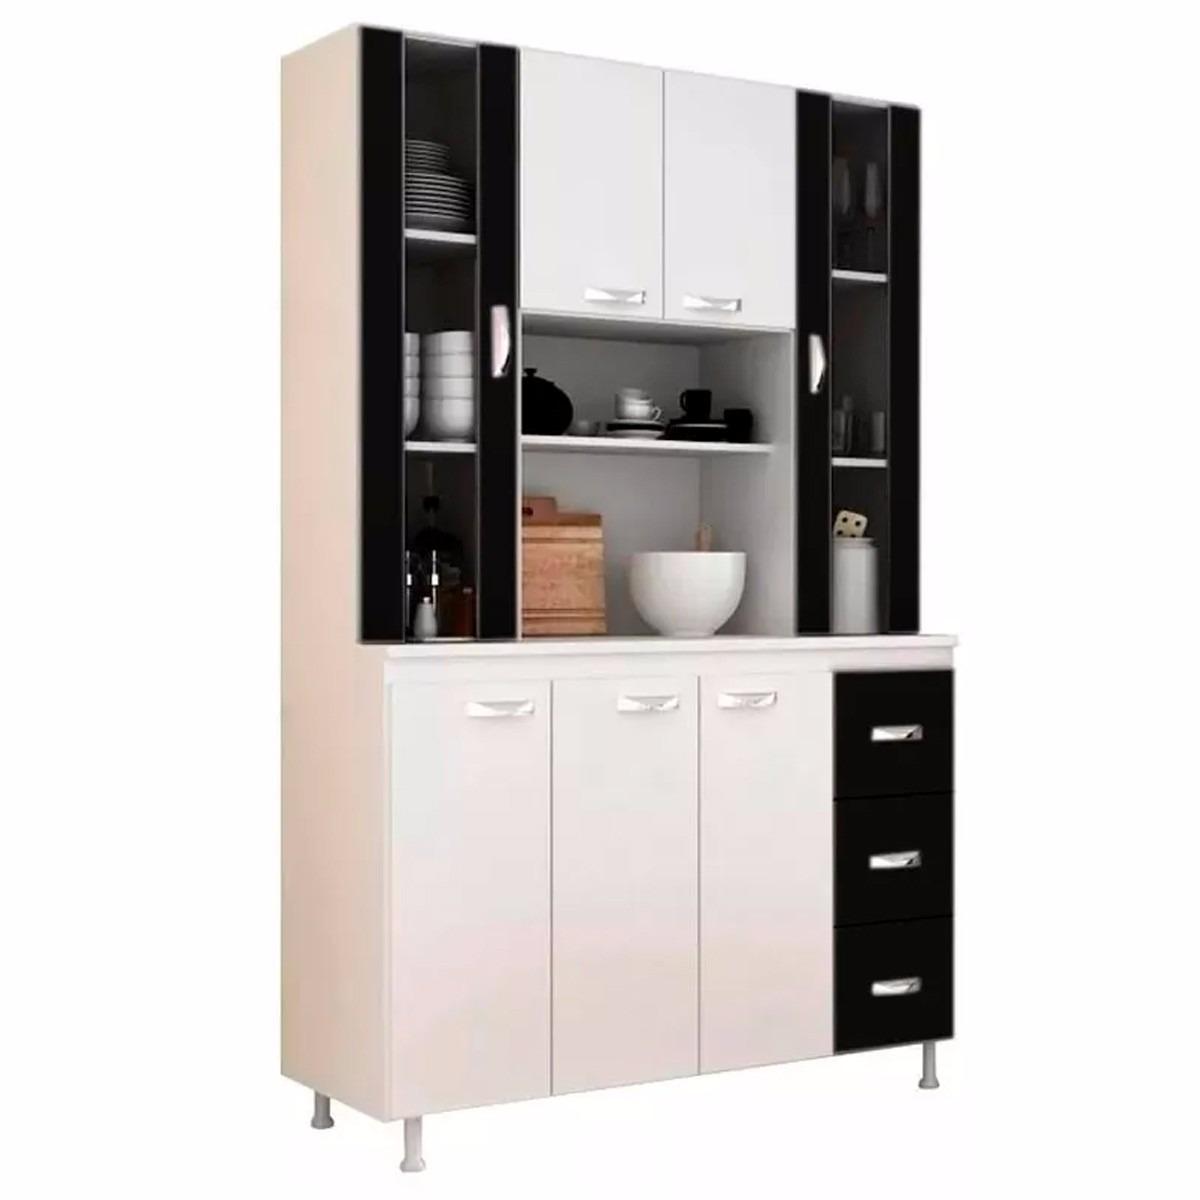 Cocinas kit online mueble bajo para fregadero de cocina for Muebles de cocina en kit online